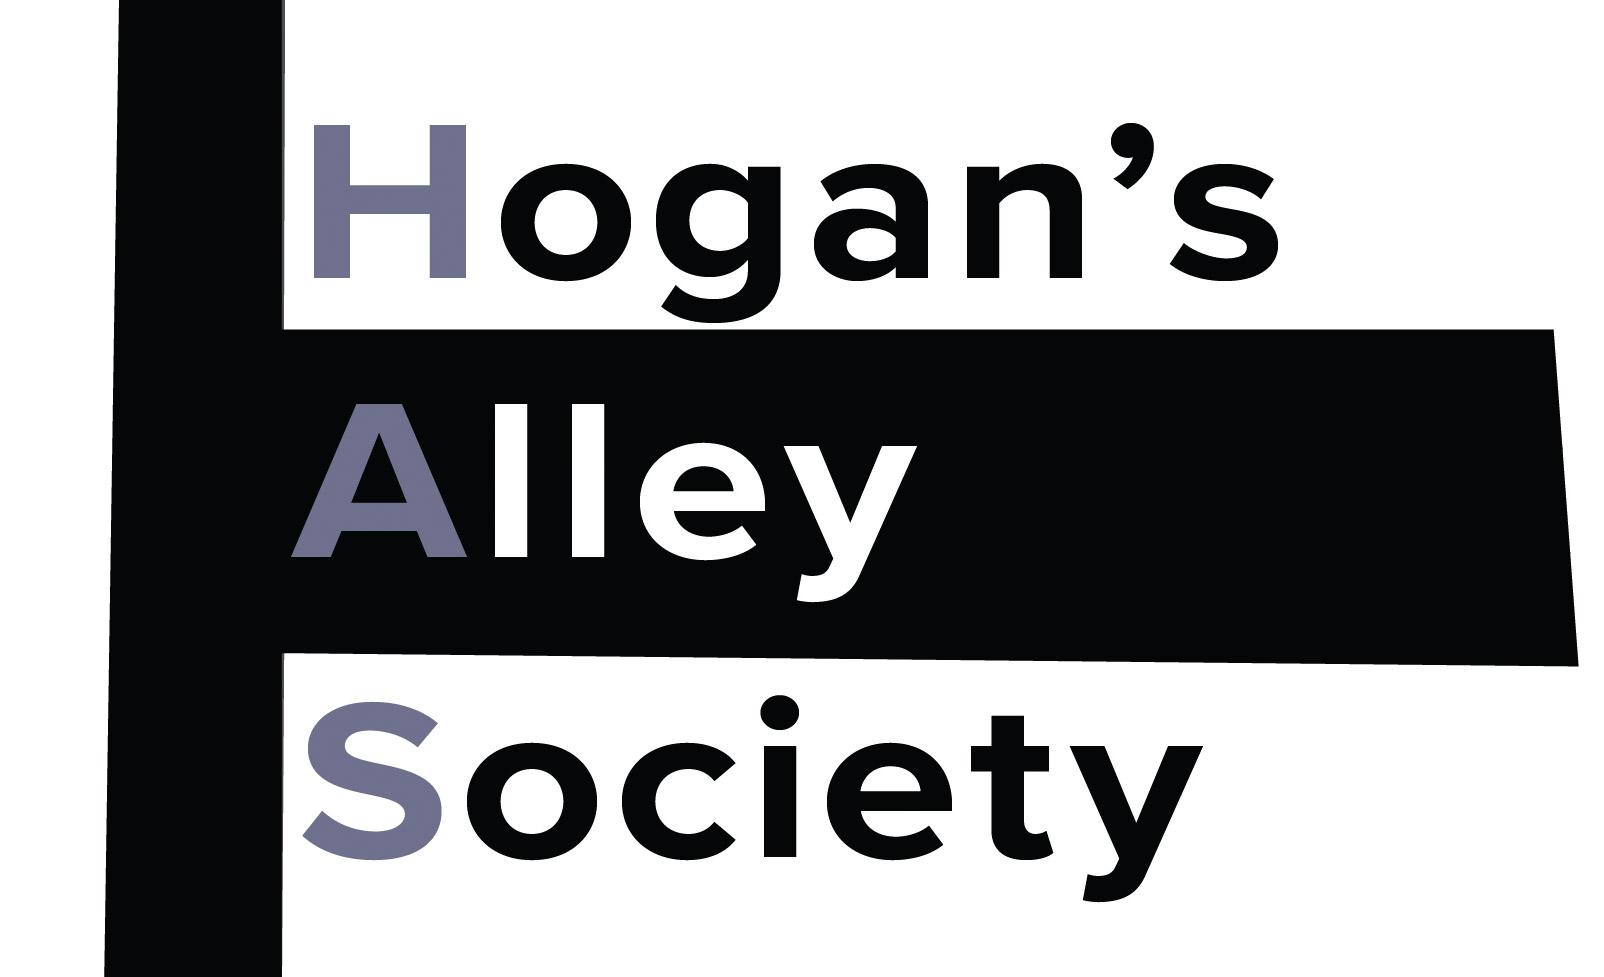 Hogan's Alley Society